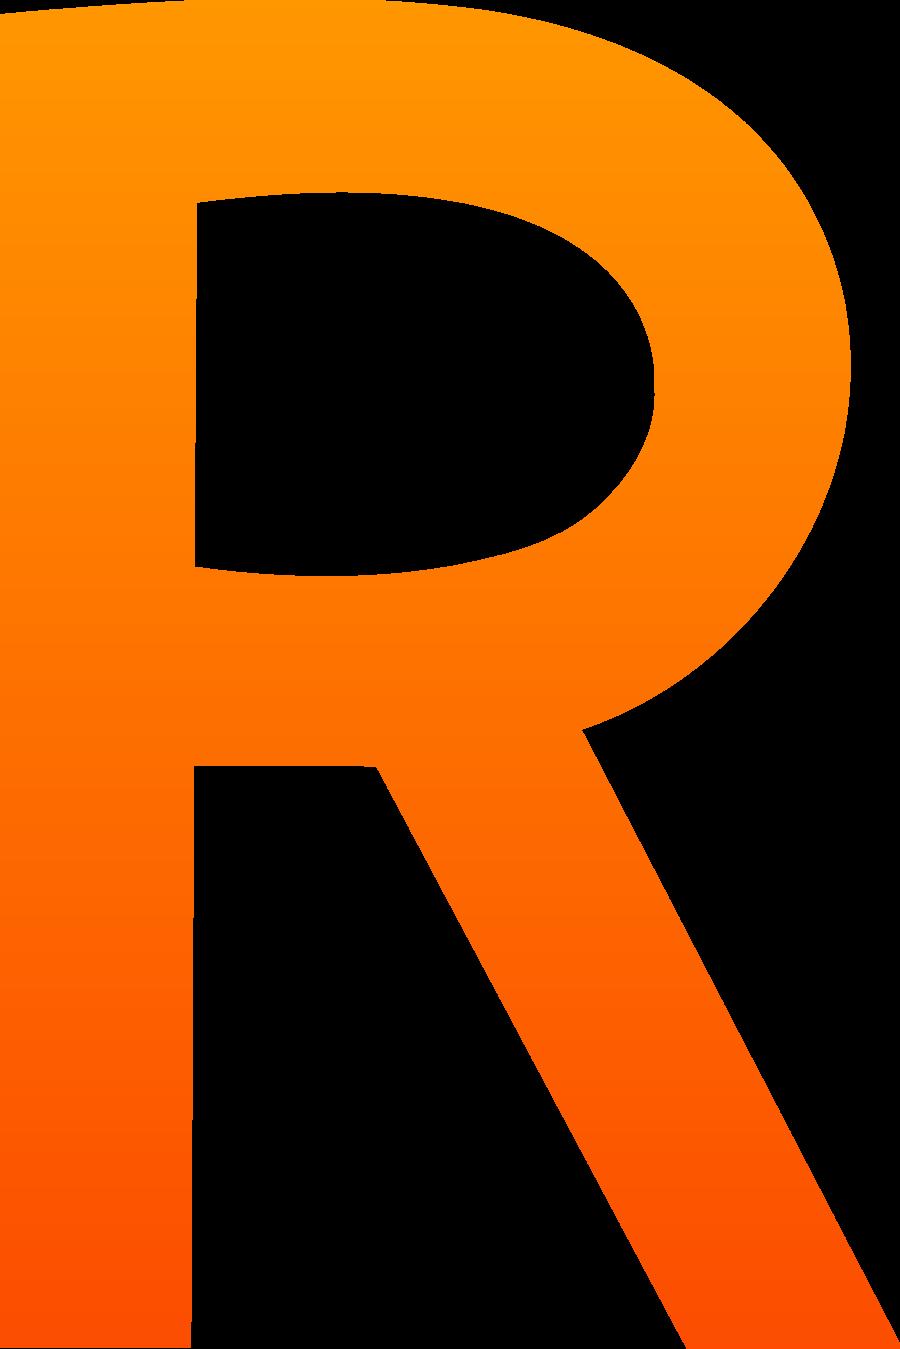 R clipart transparent. Yellow circle rectangle clip